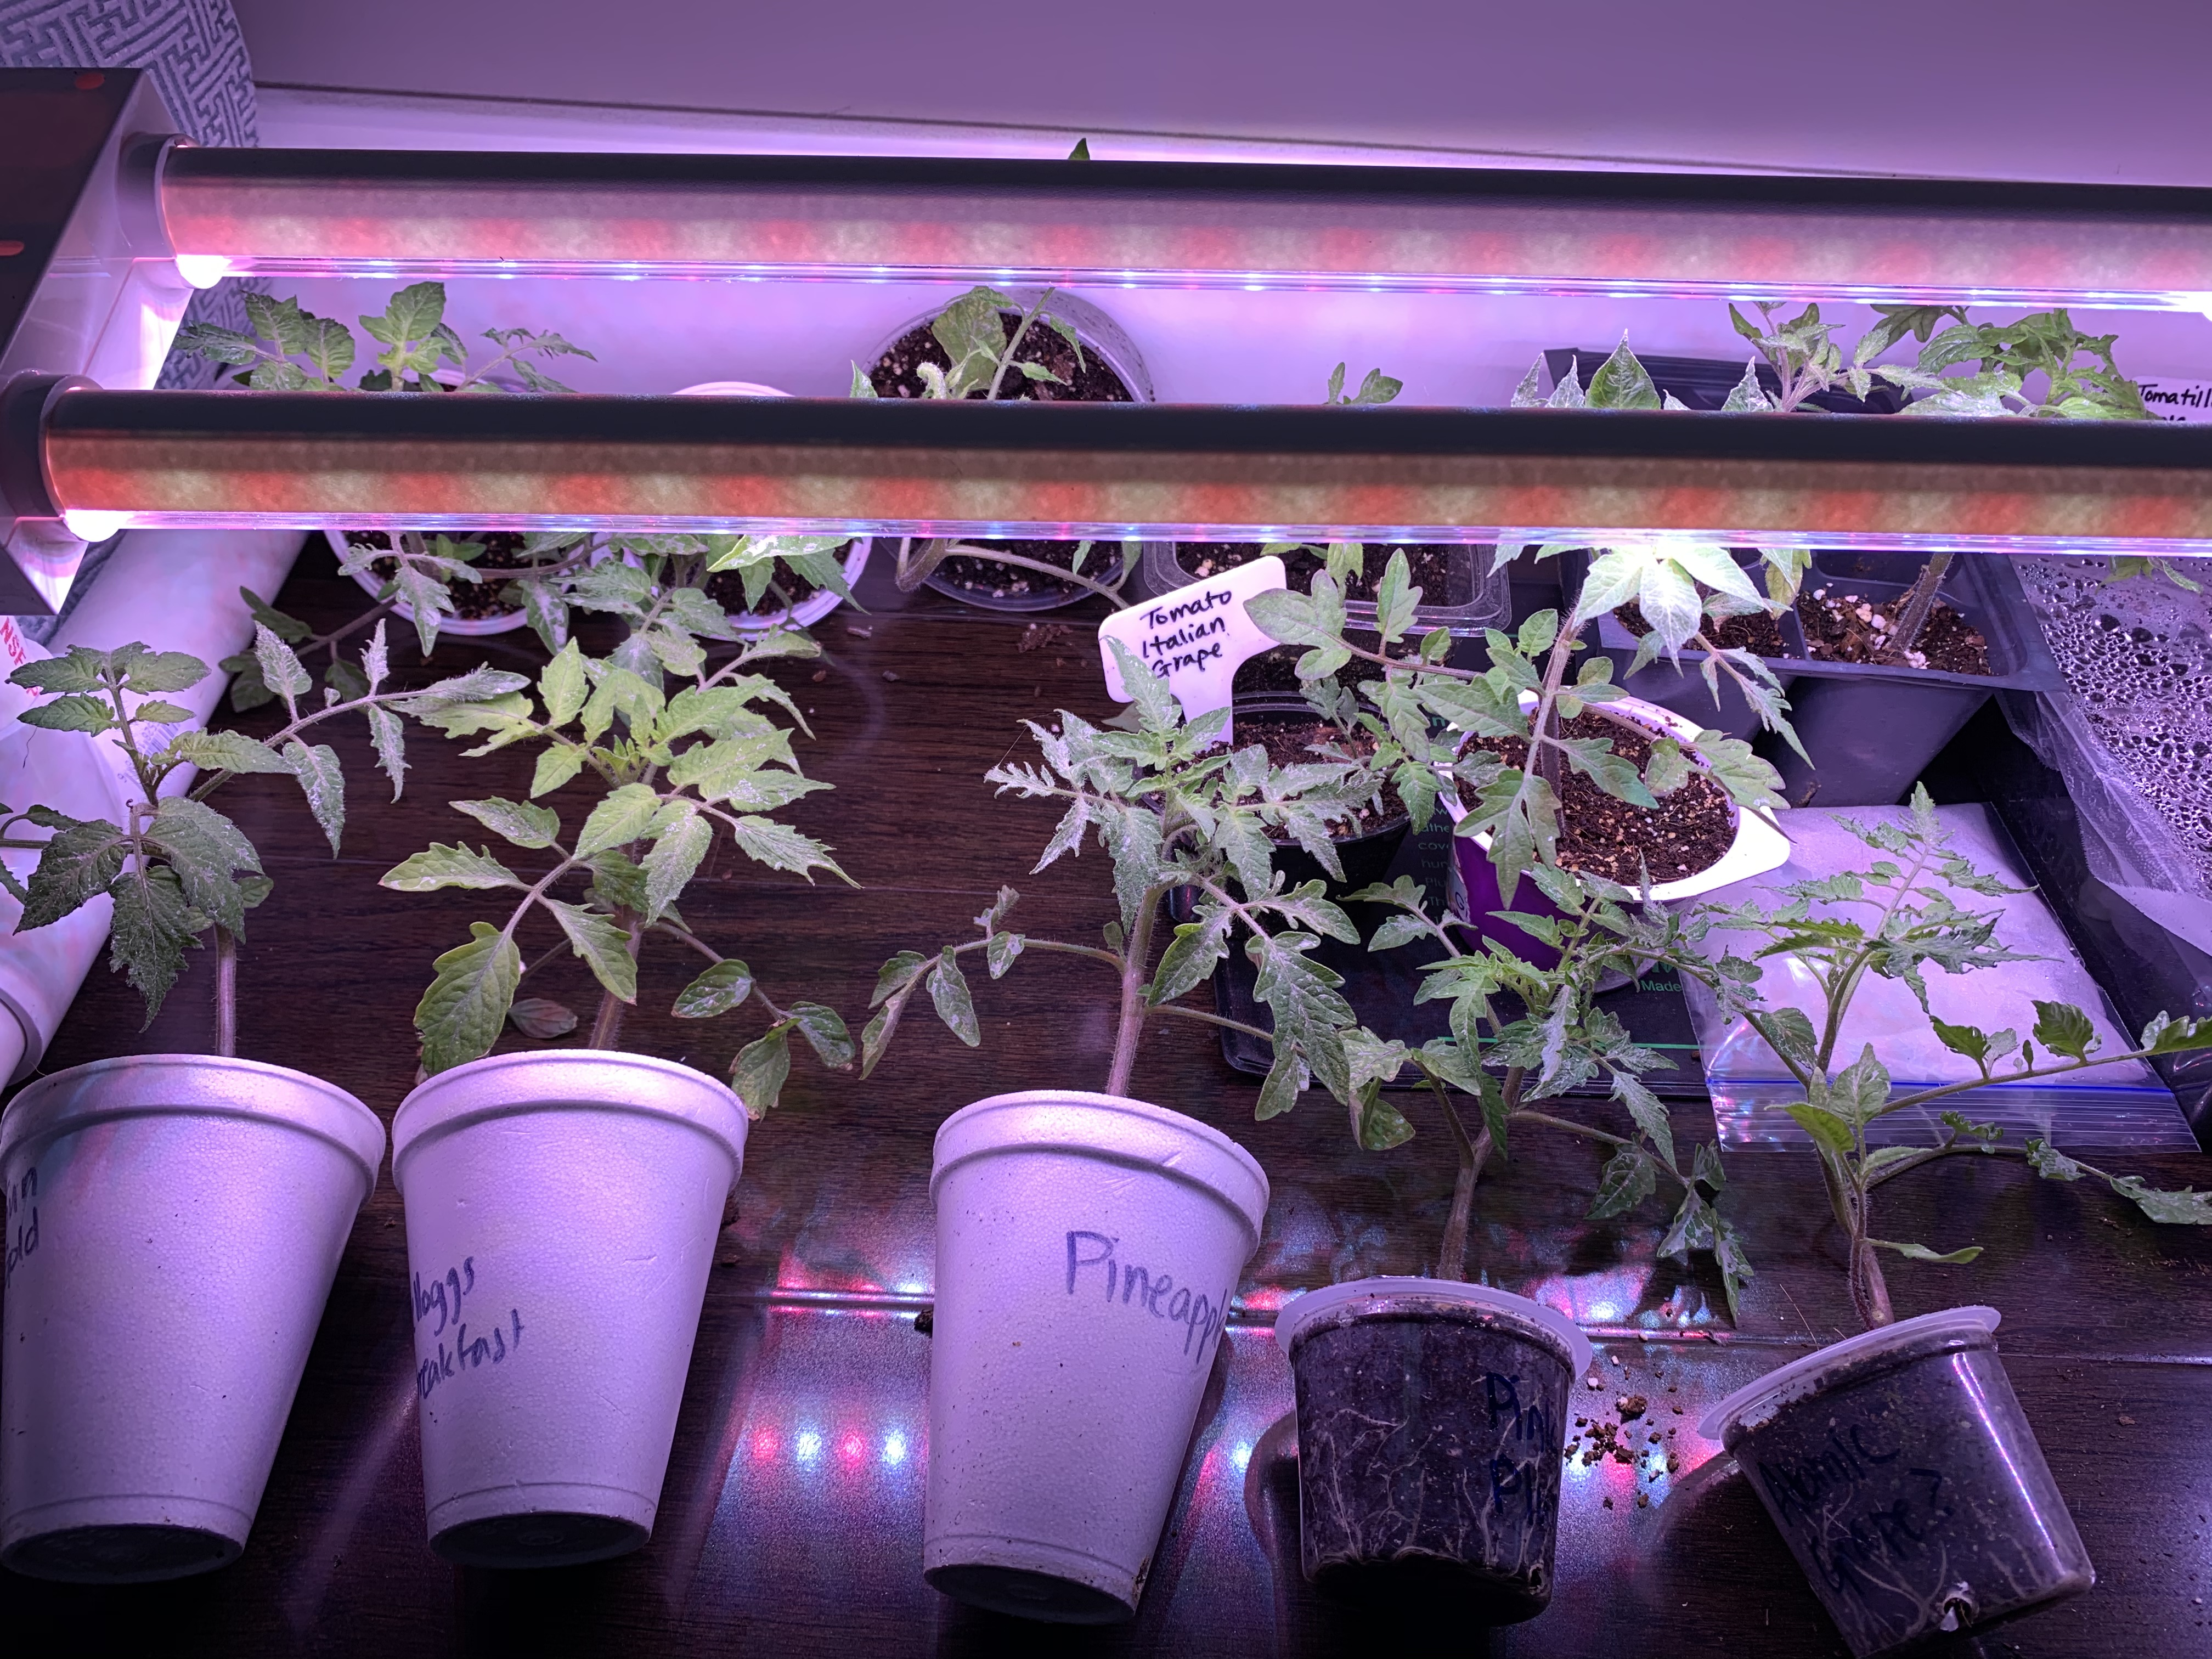 6F5B35C8 CCF6 4CA9 9CF4 07D6FB2ACF45 Self-control when gardening